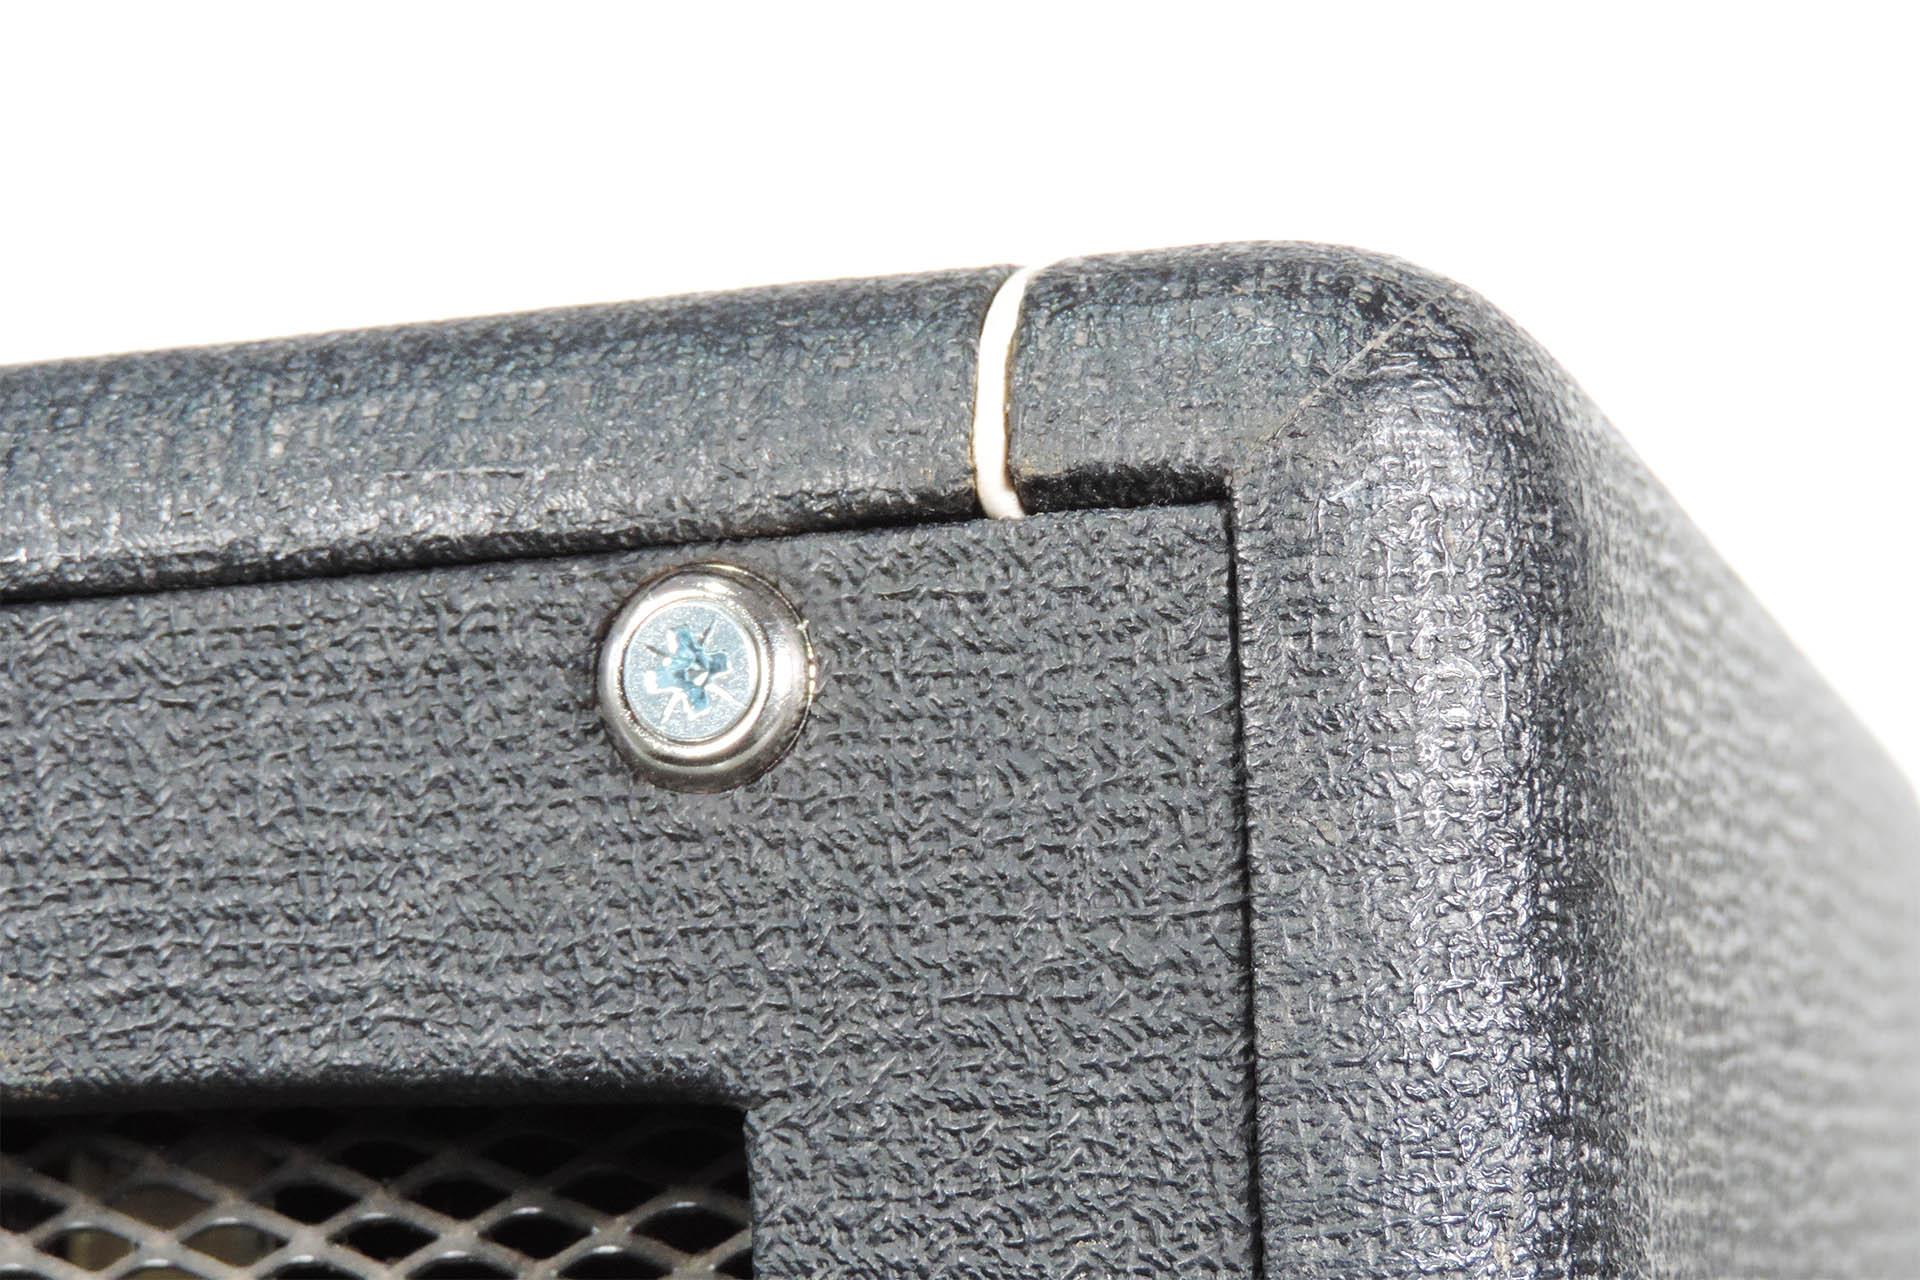 Hiwatt DR-103 renovation - new screws and screw-cups